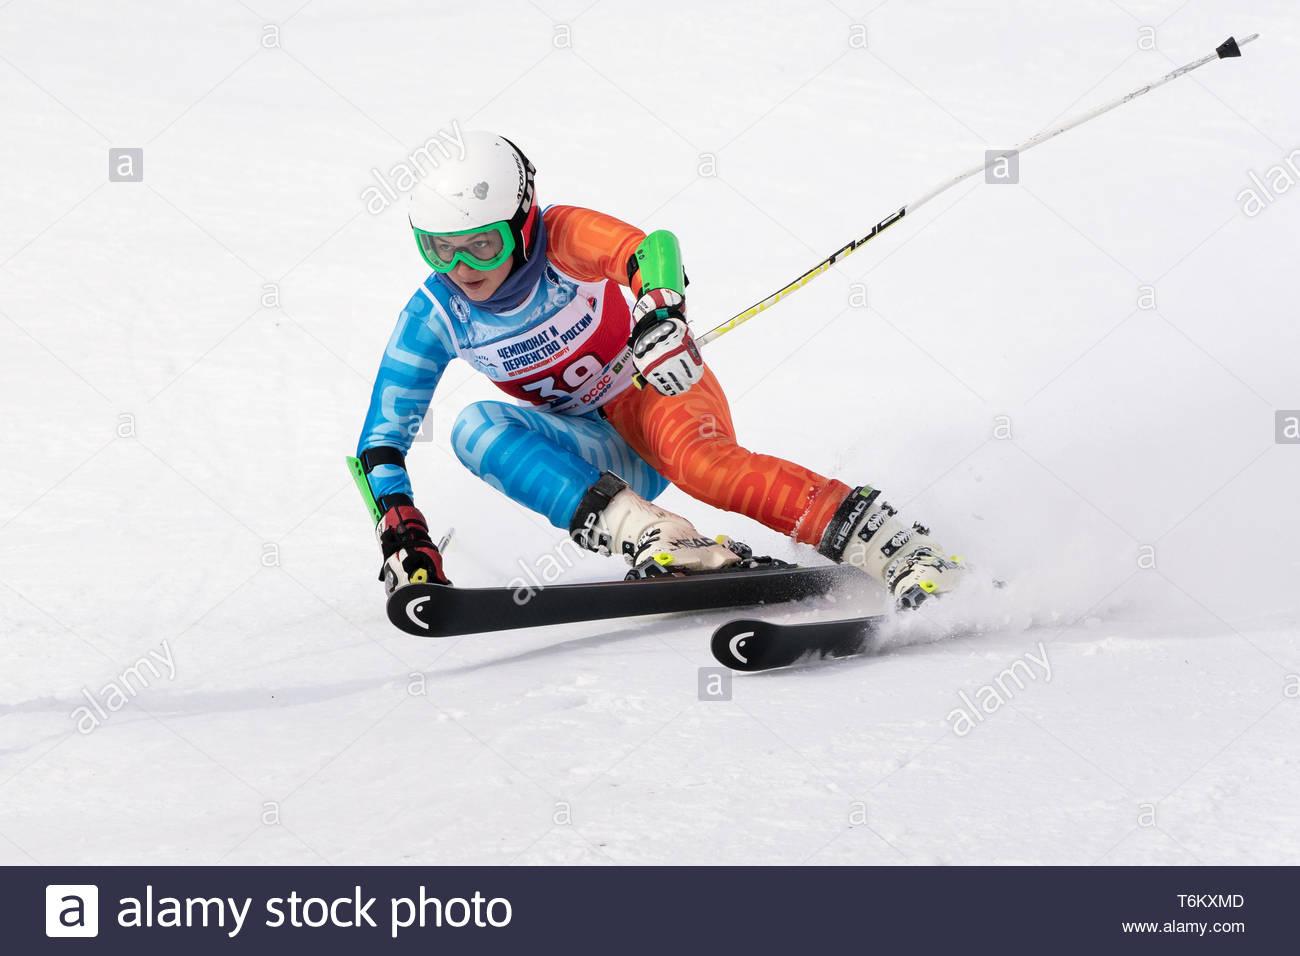 KAMCHATKA PENINSULA, RUSSIA - APR 2, 2019: Mountain skier Fugleva Victoria (Sakhalin) skiing down mount slope. Russian Women's Alpine Skiing Cup, Inte - Stock Image